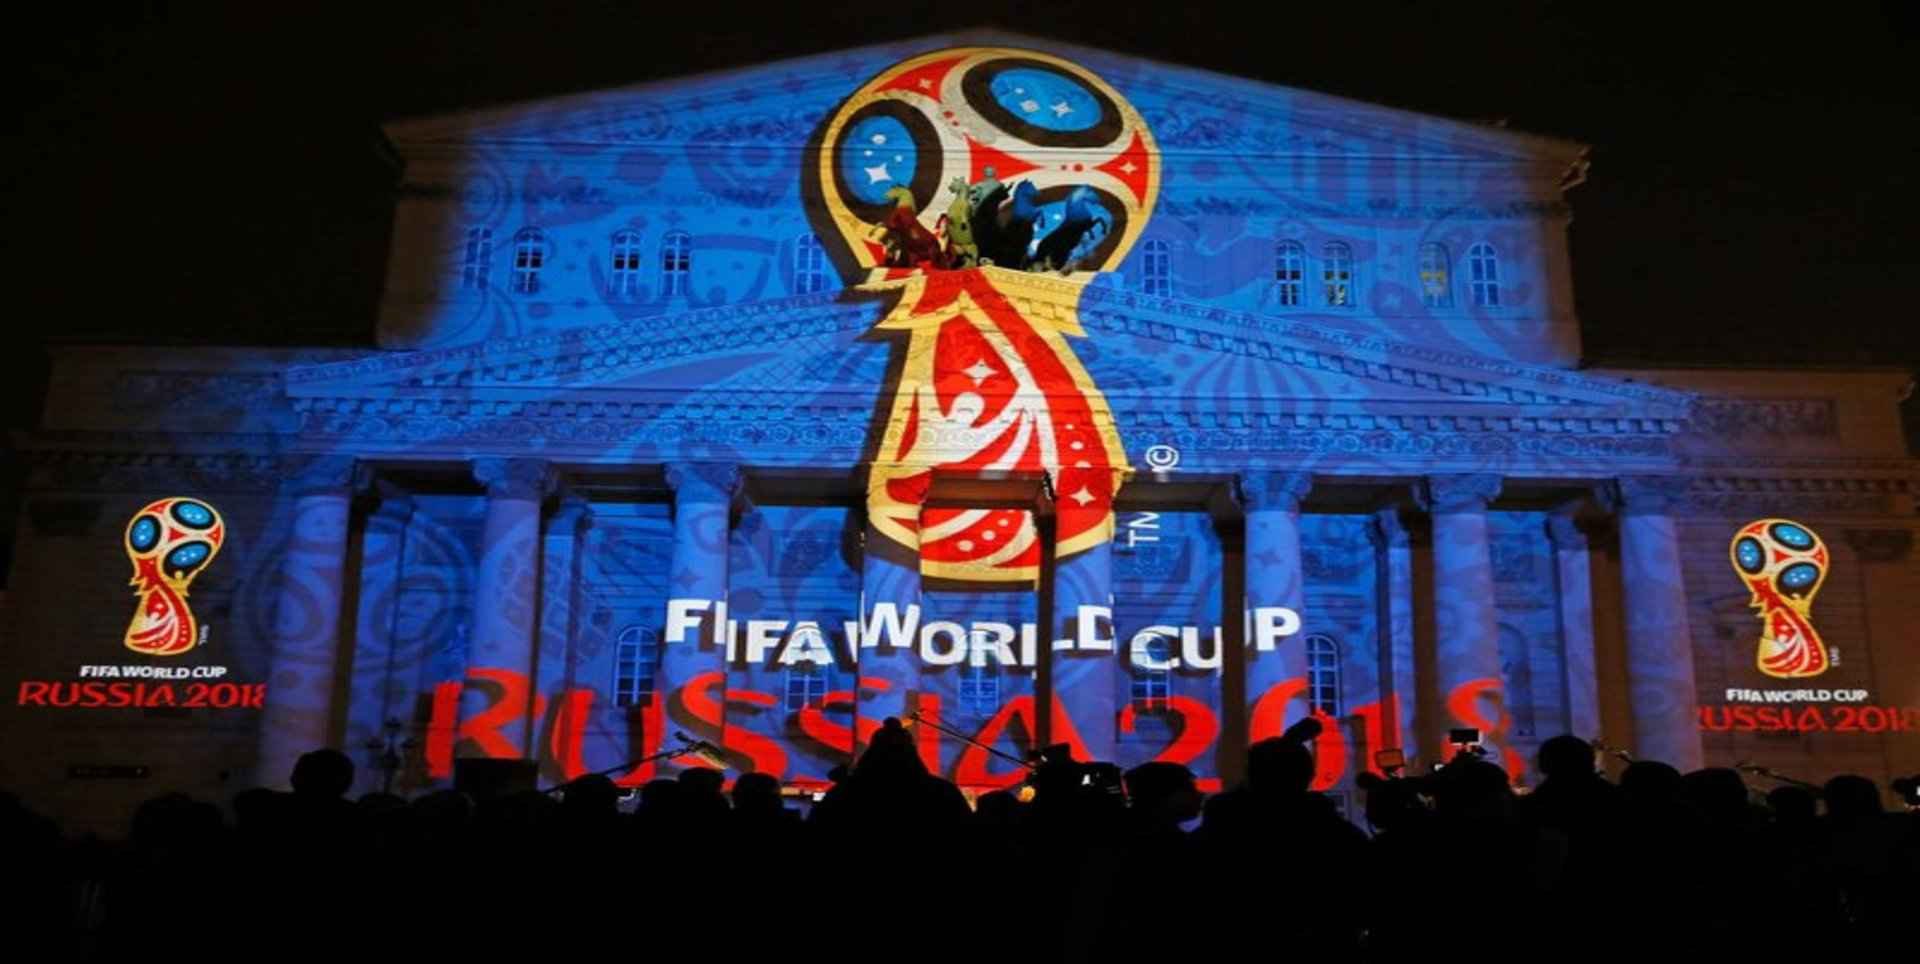 2018 FIFA AFC Third Round Syria VS Uzbekistan Live HD